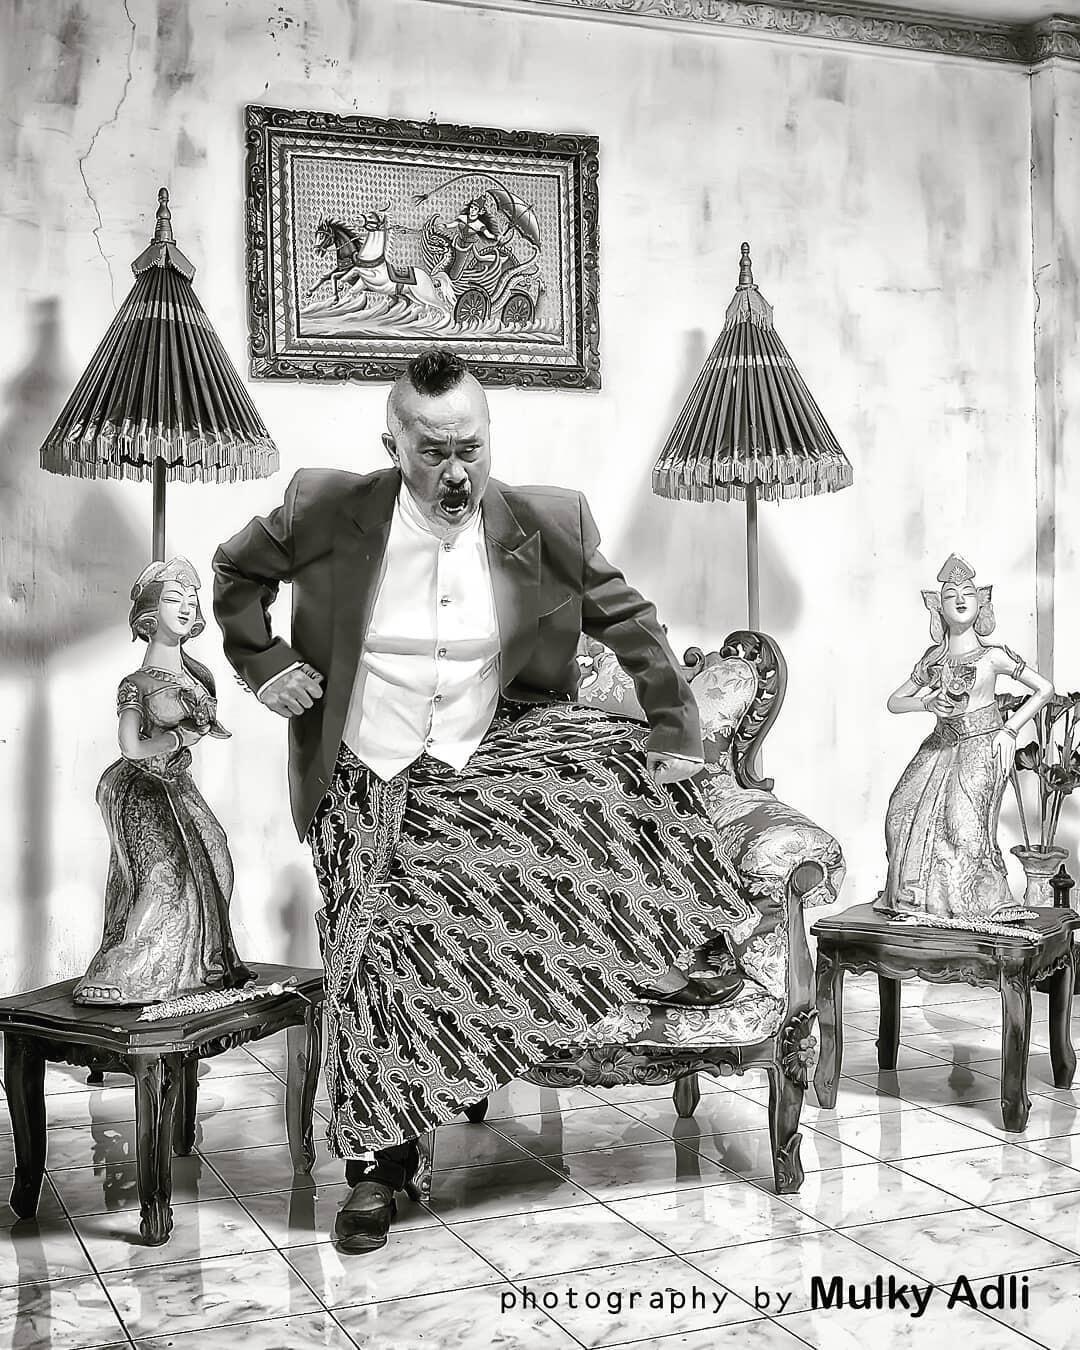 Pelawak Gogon Meninggal Dunia, Ini 5 Perjalanan Kariernya